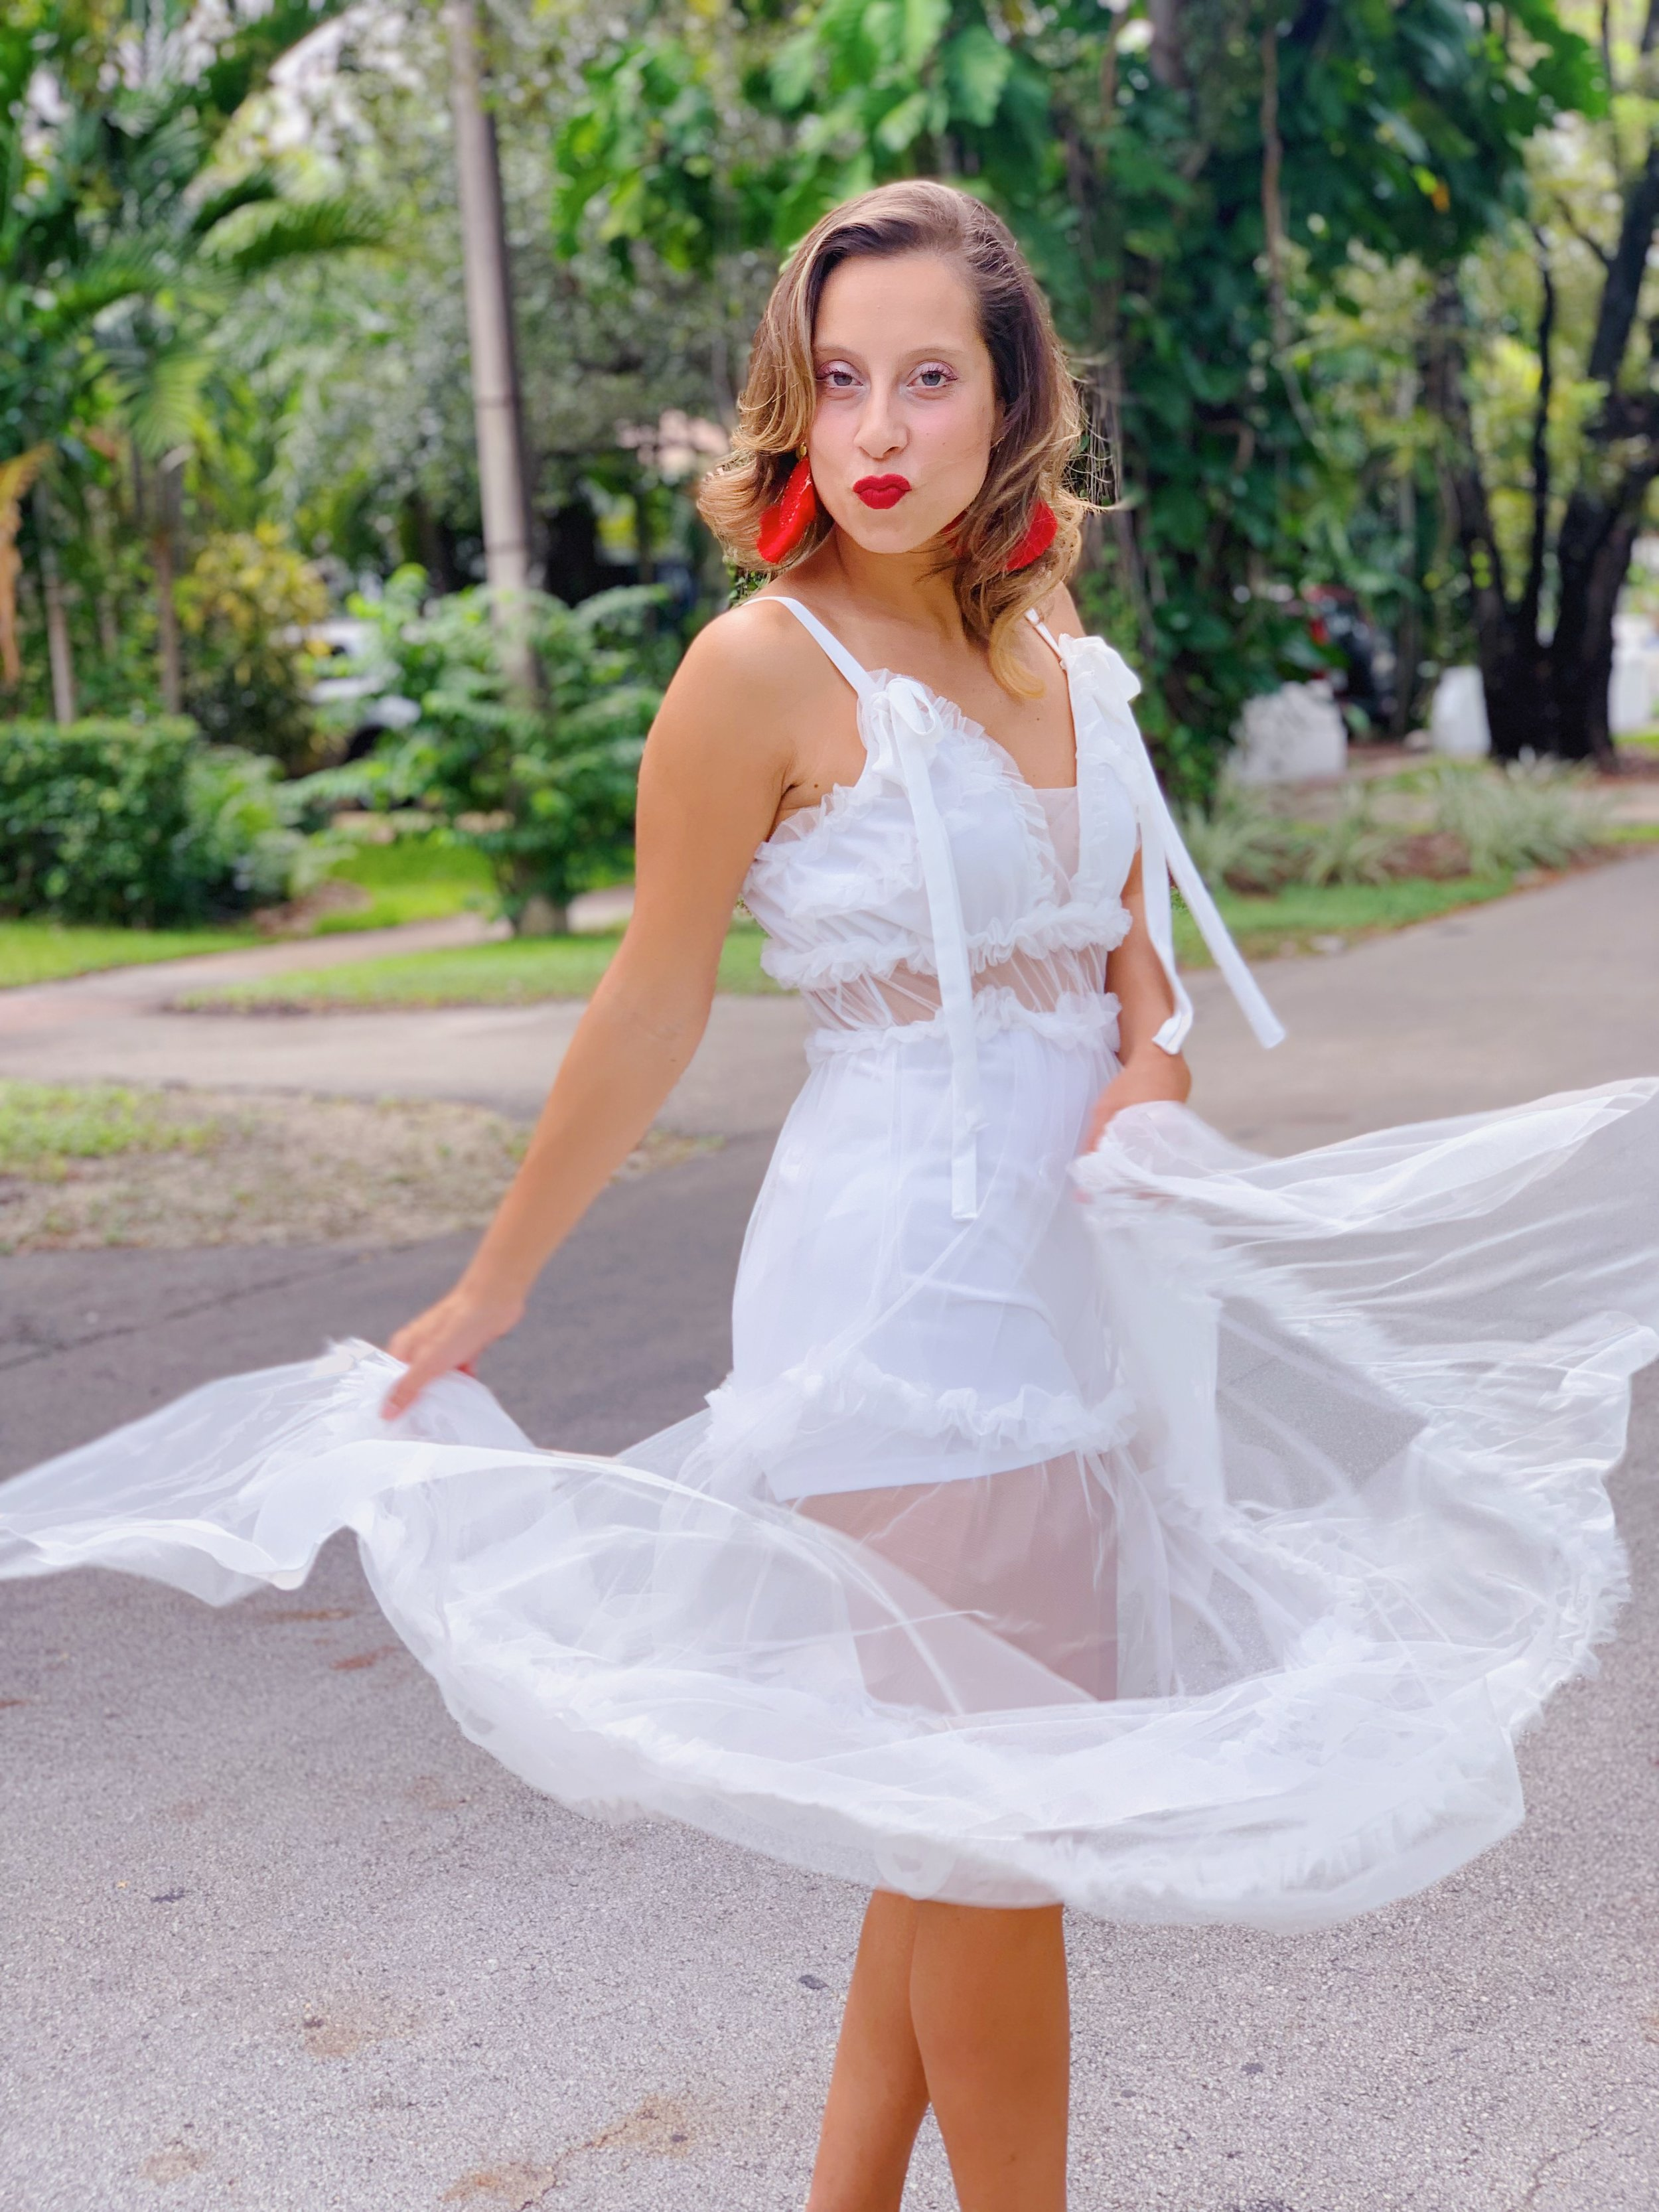 Gelsandra Guzman  Fashion Consultant   @gelsandra_guzman